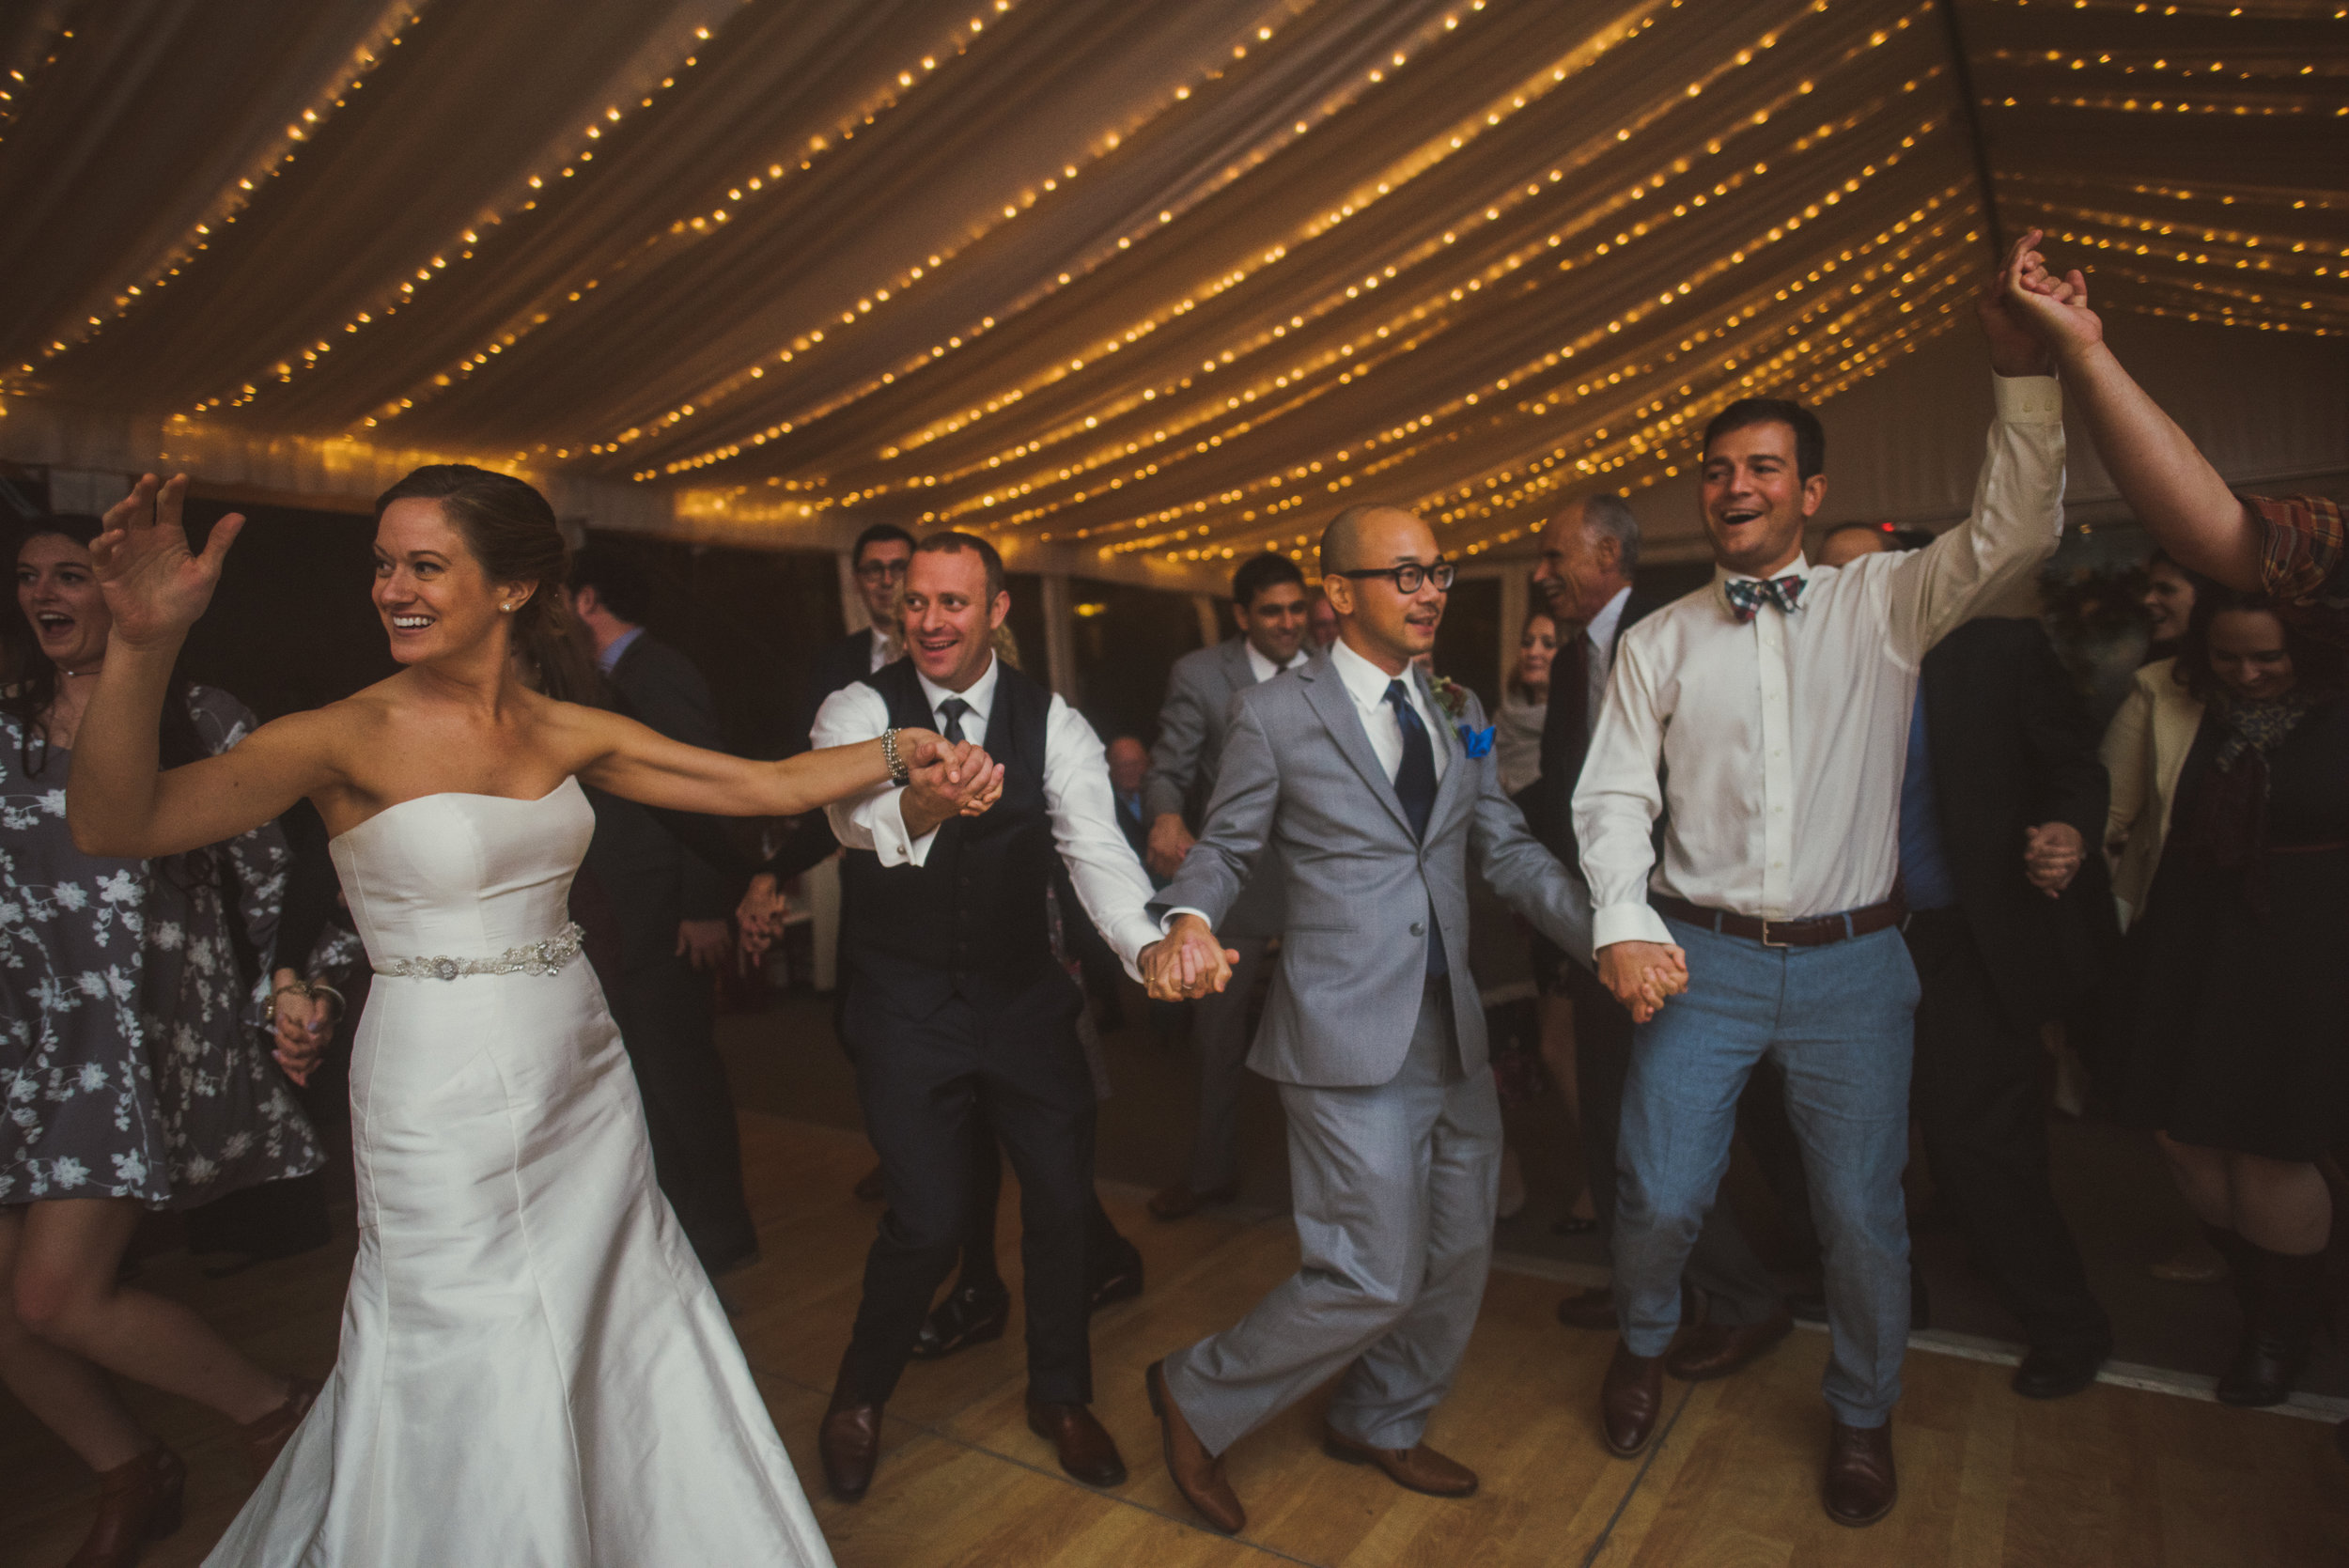 JACQUELINE & ANDREW WARSHAWER -BROOKMILL FARM FALL WEDDING - INTIMATE WEDDING PHOTOGRAPHER - TWOTWENTY by CHI-CHI AGBIM-657.jpg